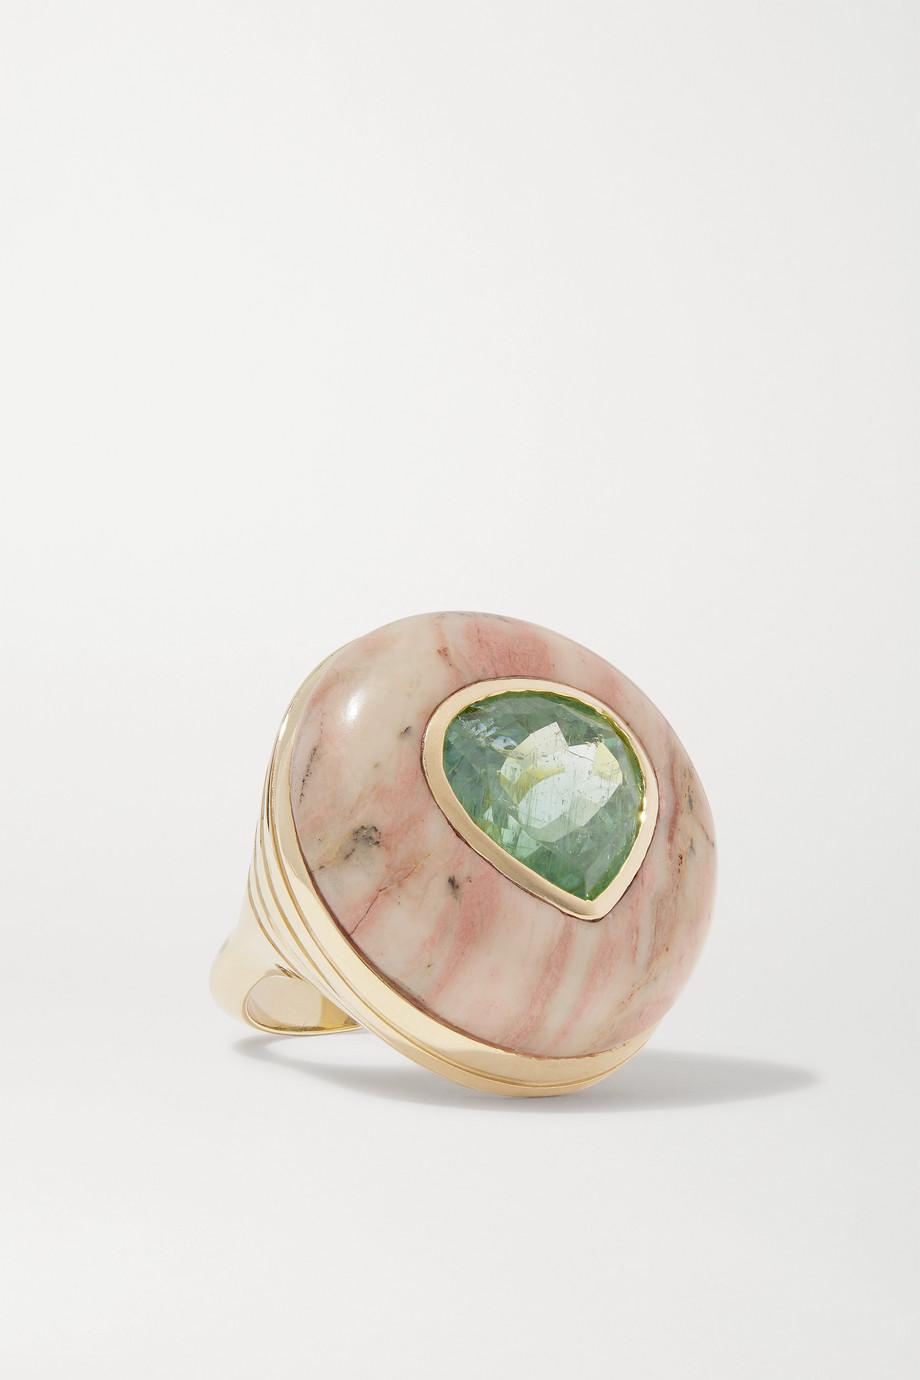 Retrouvaí Lollipop 14-karat gold, jasper and tourmaline ring